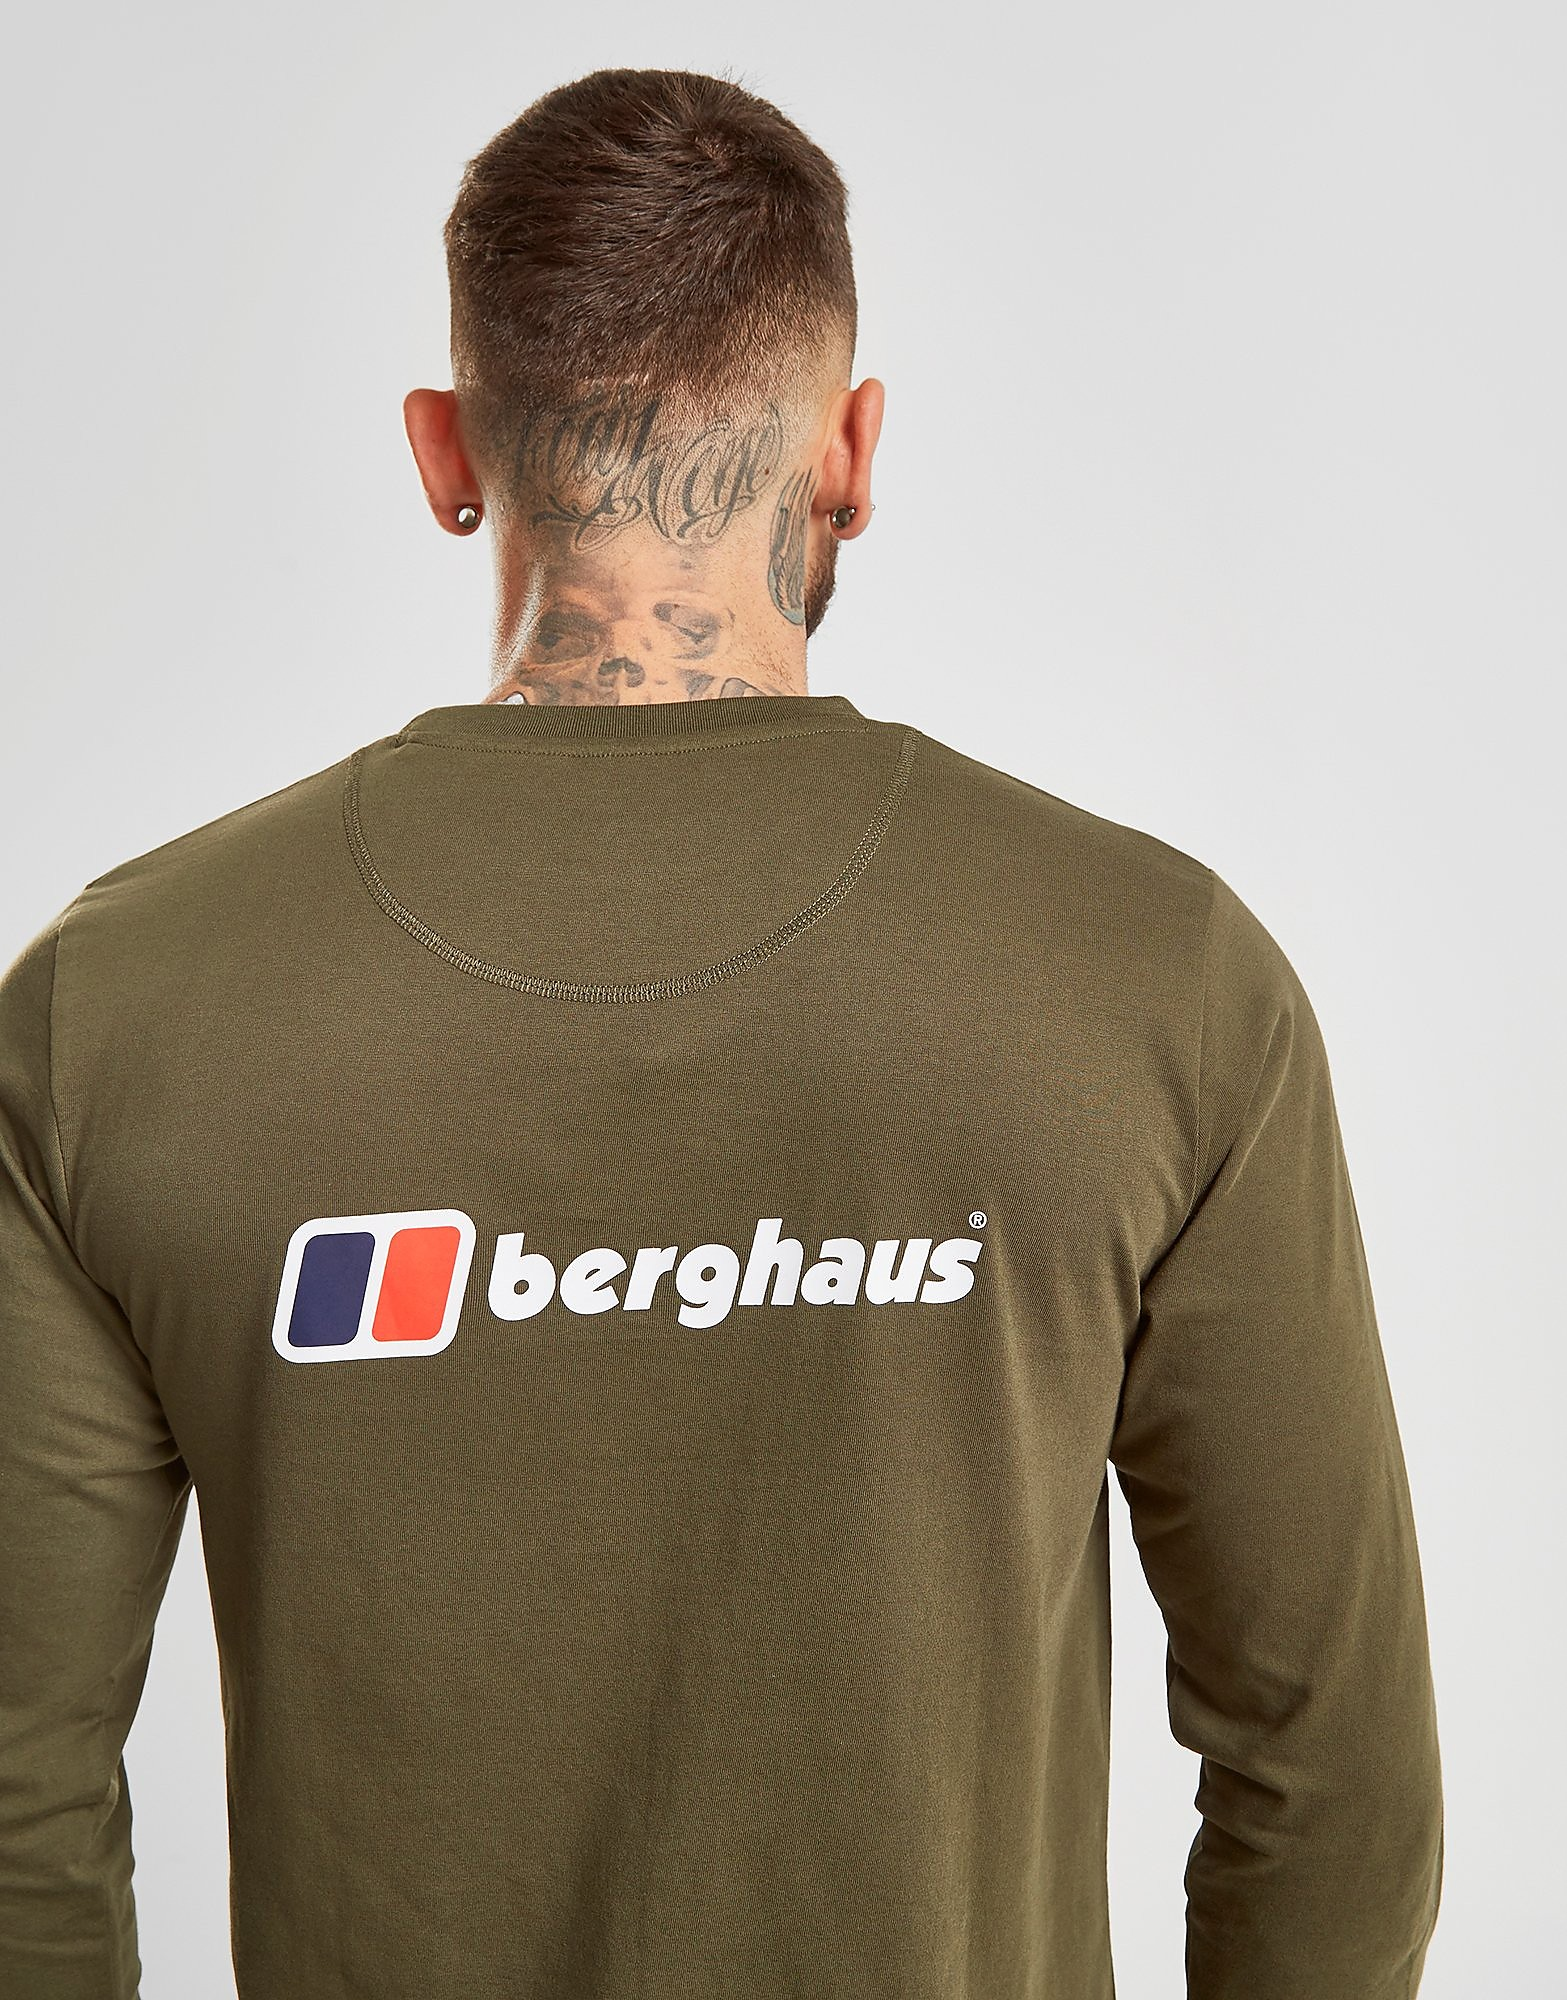 Berghaus Long Sleeve Back Logo T-Shirt